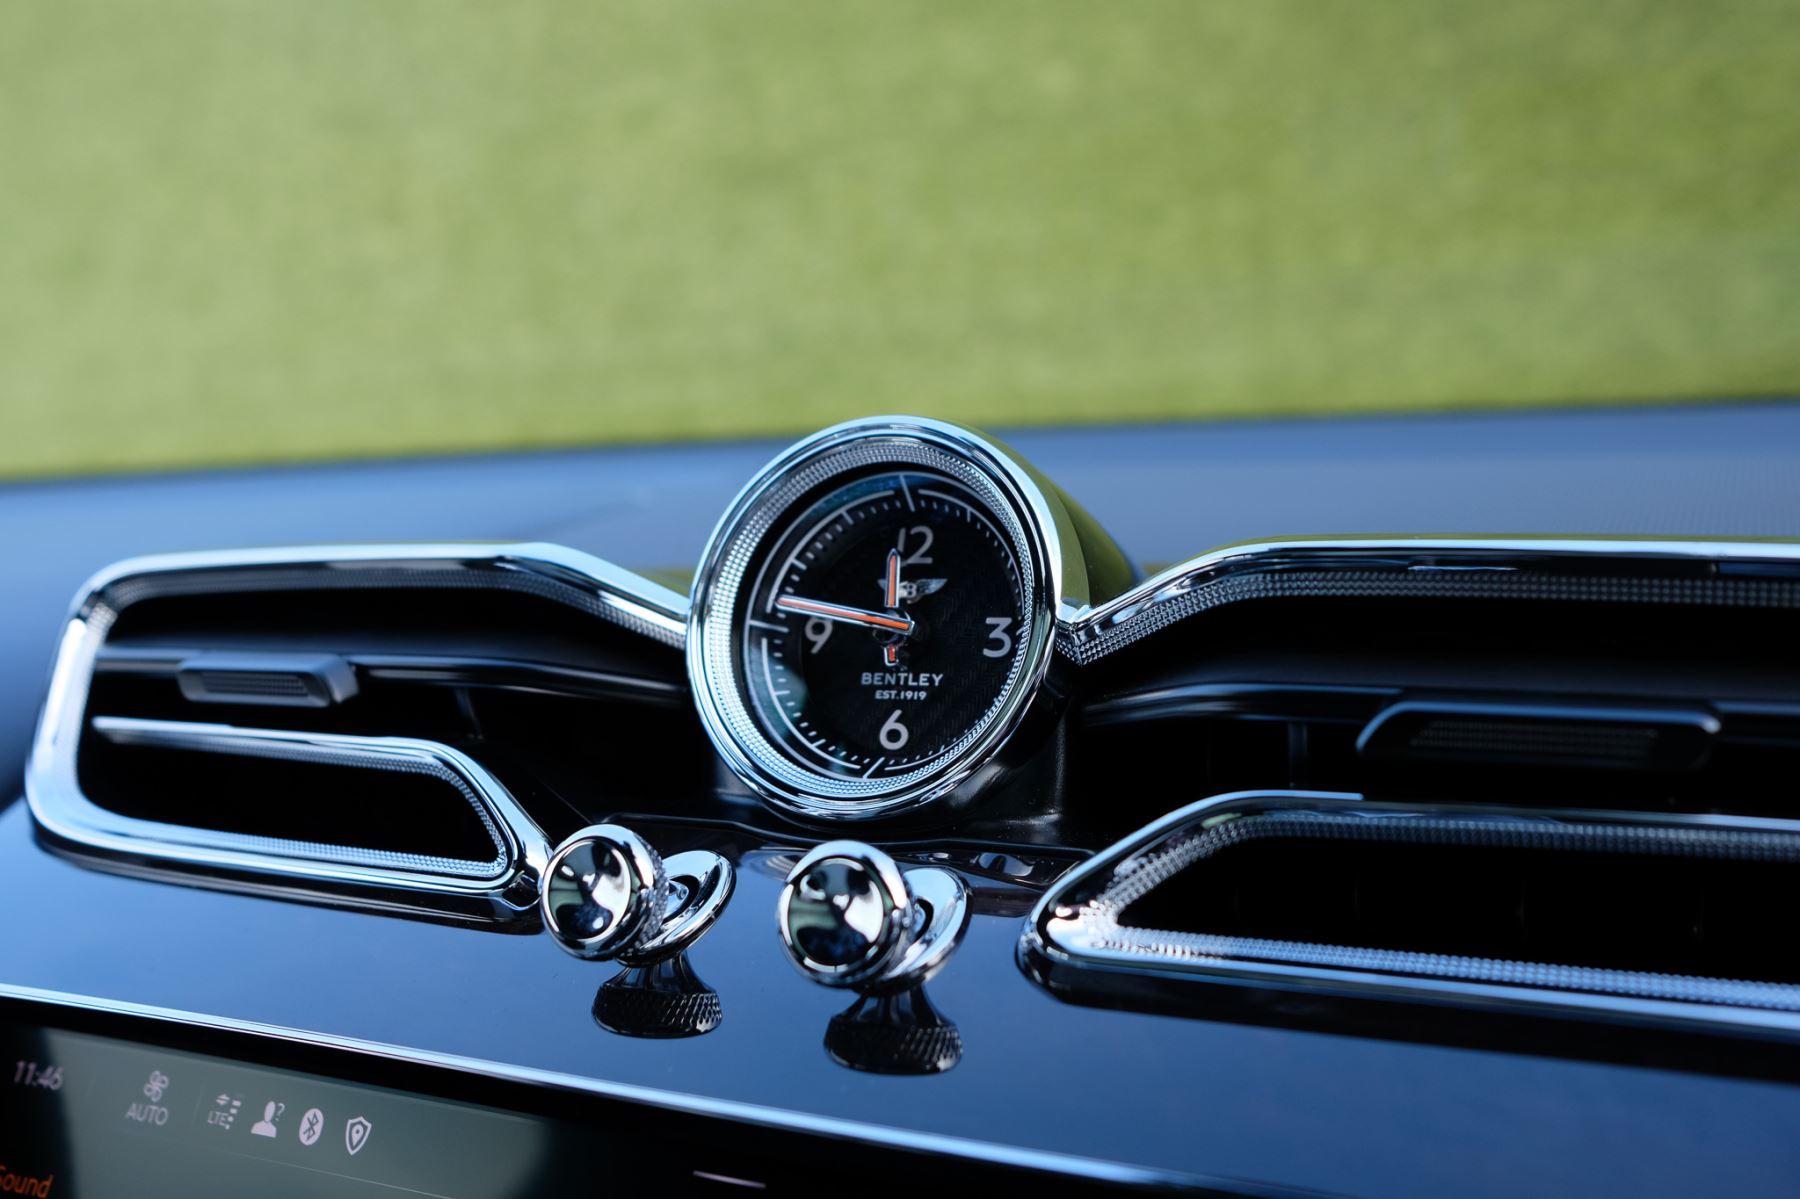 Bentley Bentayga First Edition 4.0 V8  image 19